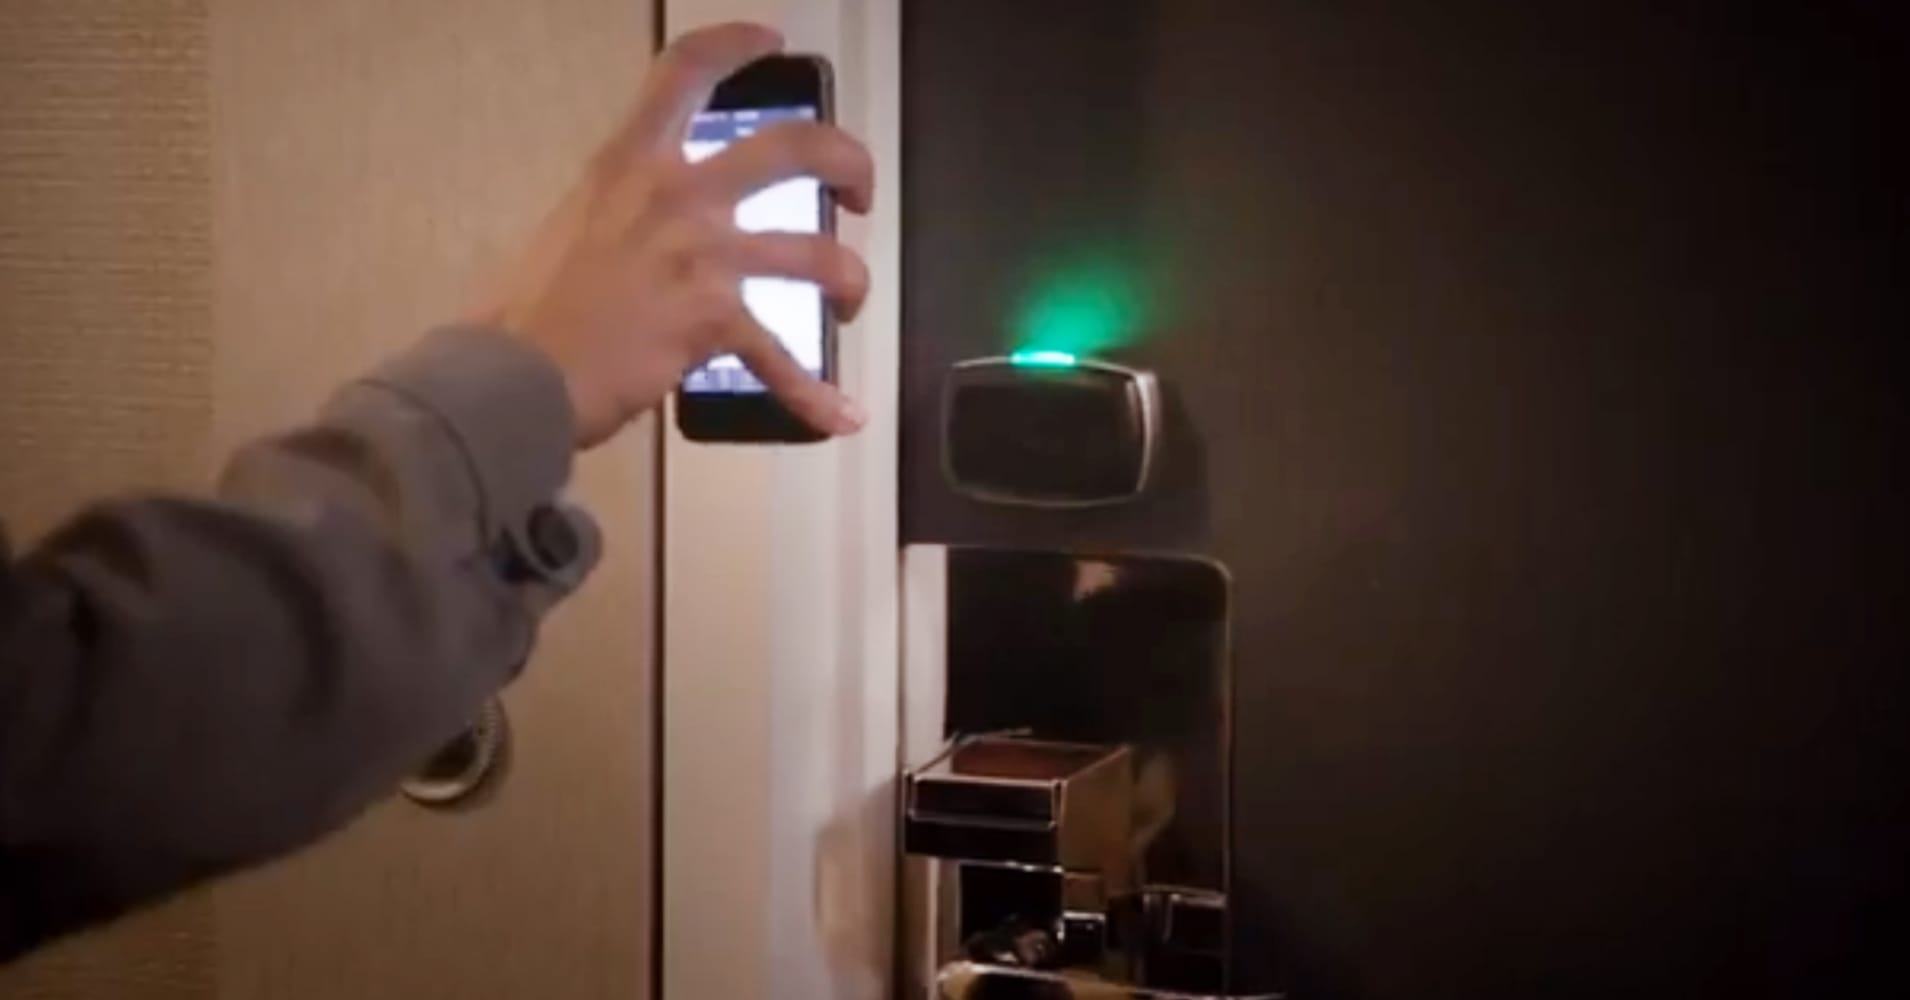 Hotels Testing Keyless Entry Via Smartphone App